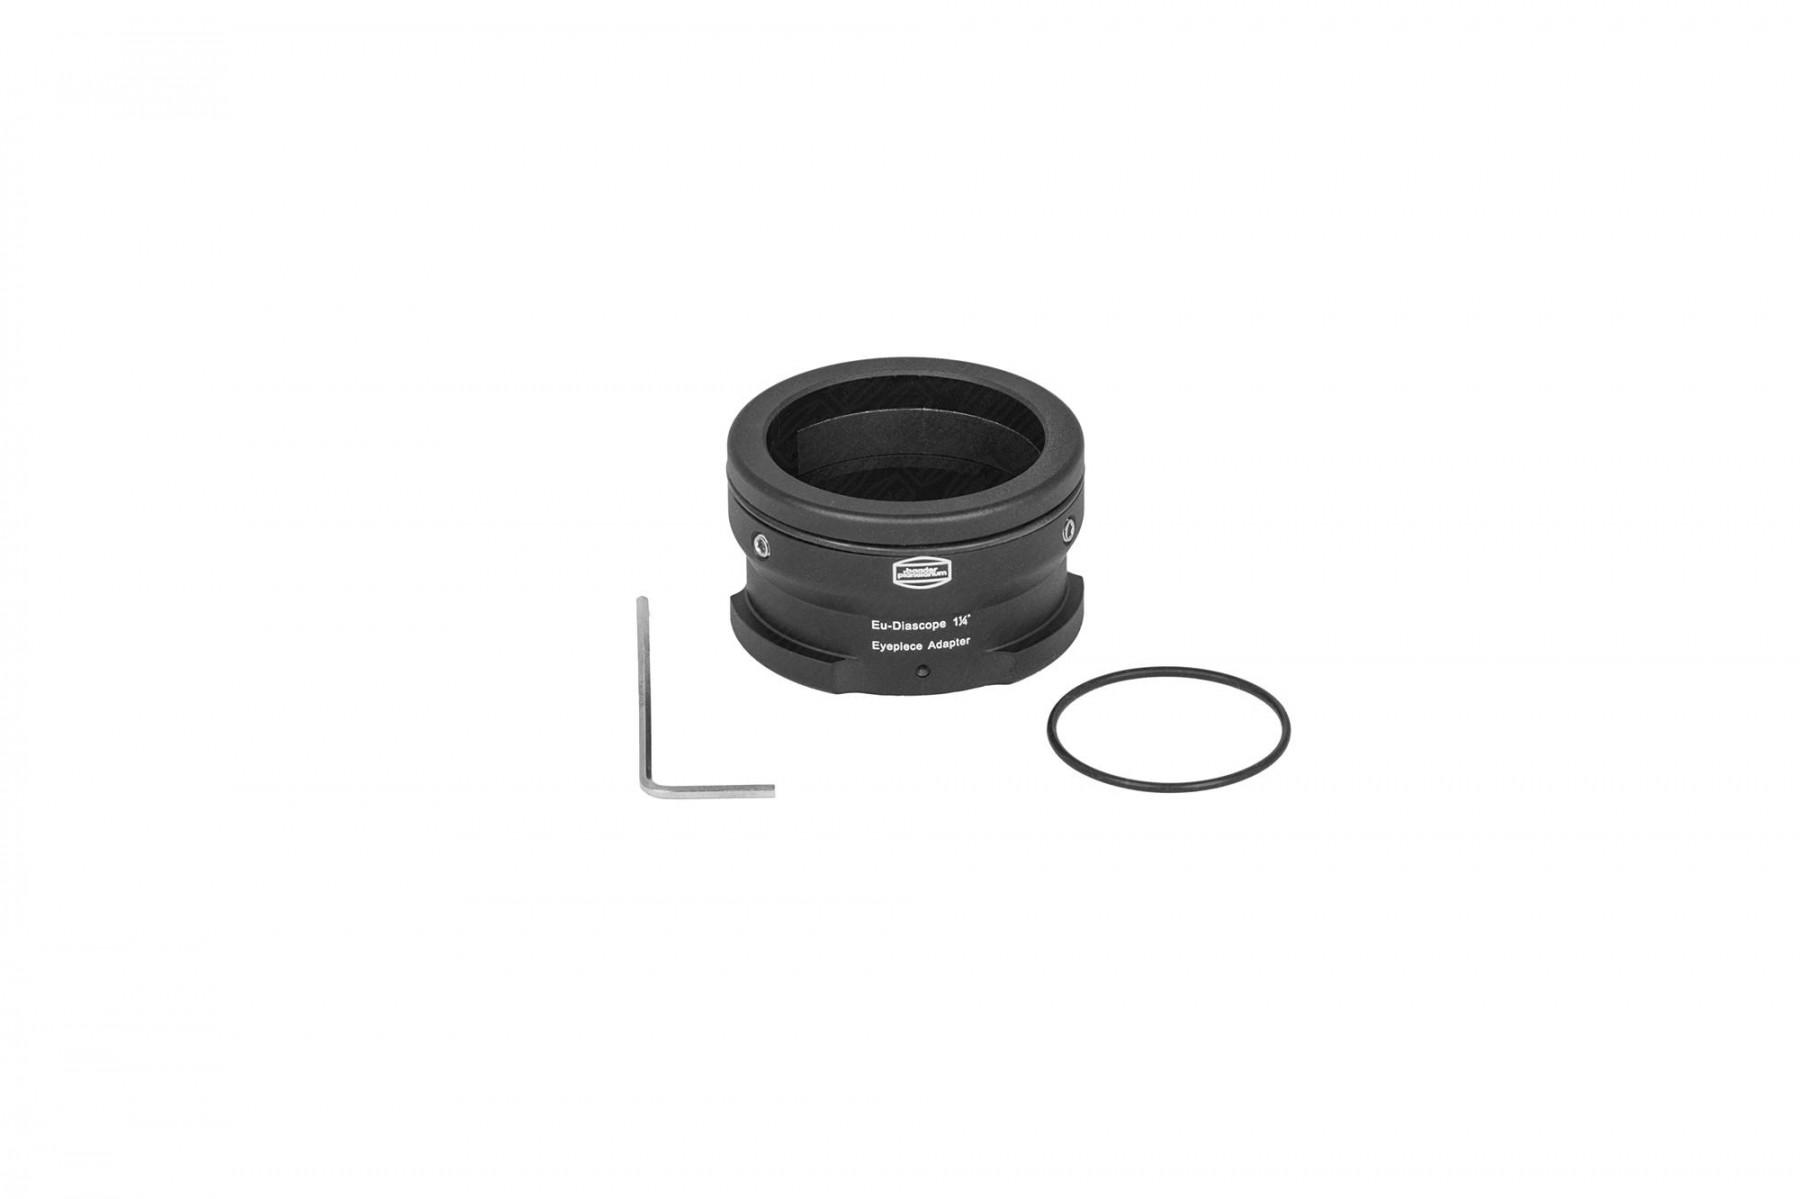 Lieferumfang: Classic Ortho 6mm und Hyperion Zoom Barlow (nicht abgebildet) Zeiss Diascope Okularbajonett, Inbusschlüssel, 2x O-Ringe (1x montiert)